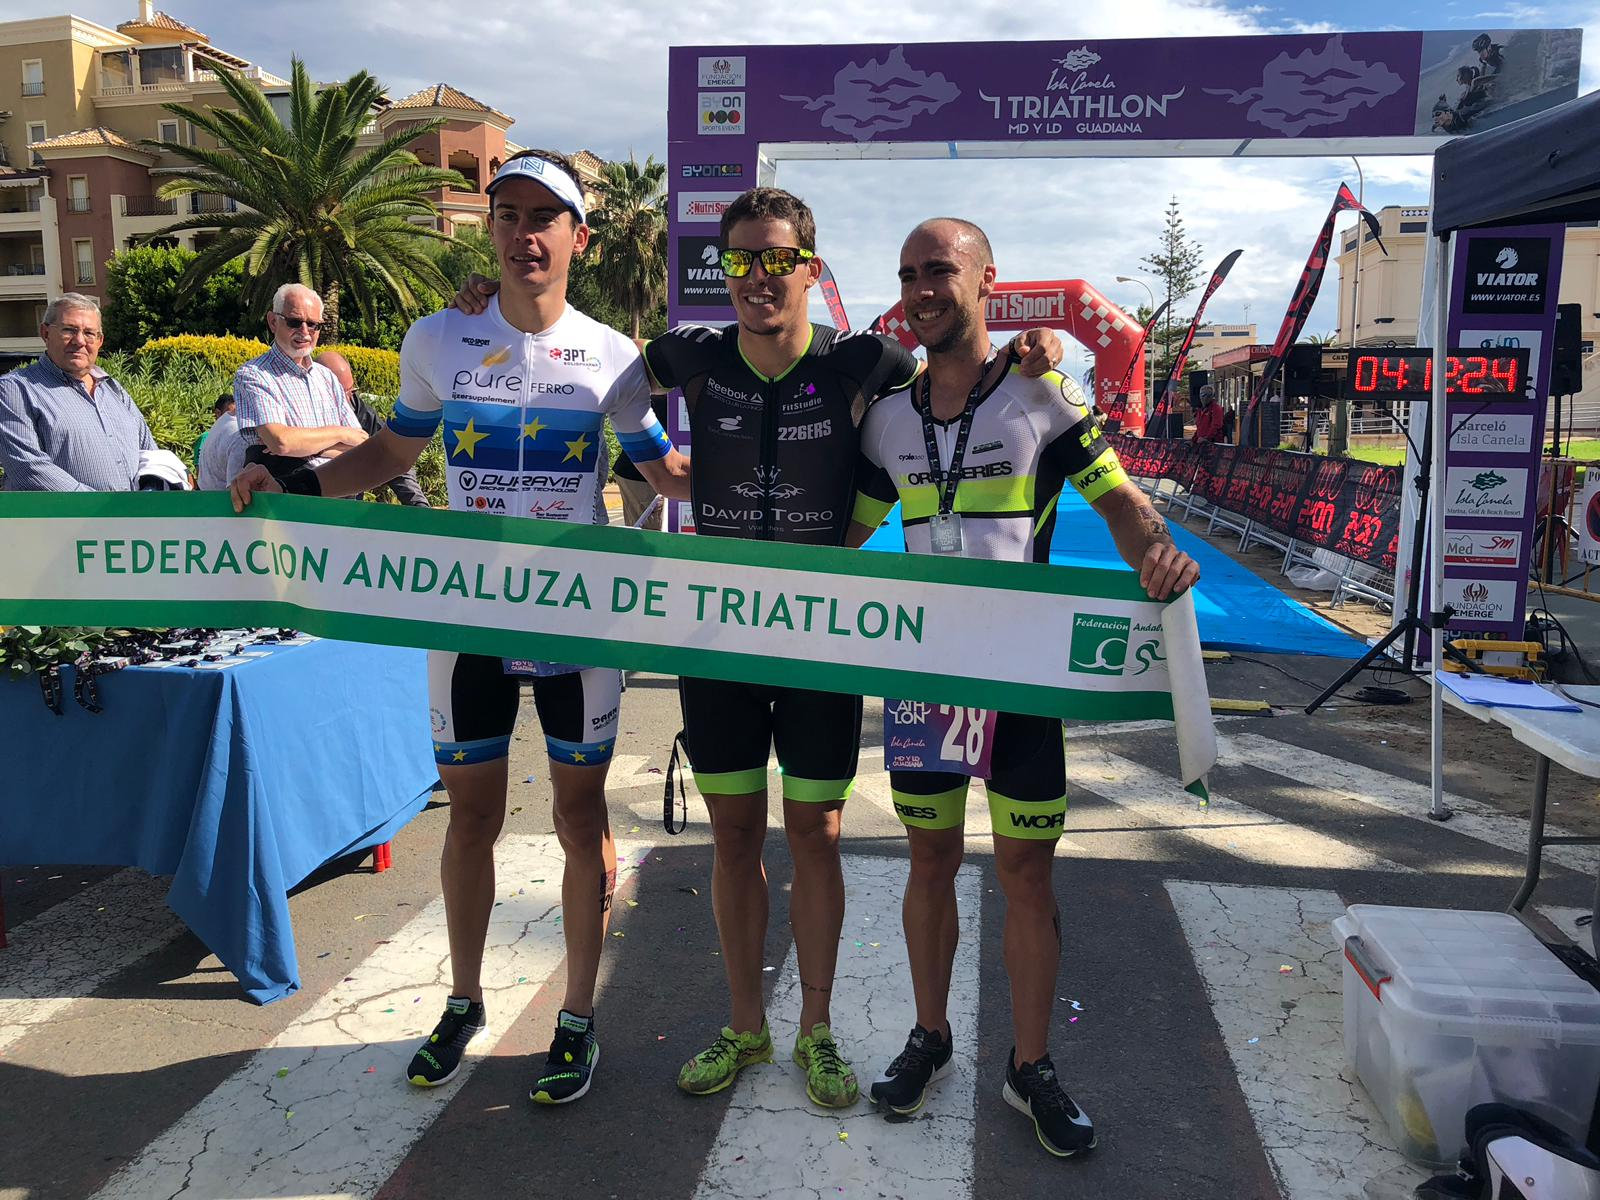 Timothy Van Houtem 2de in kampioenentrui in Guadiana